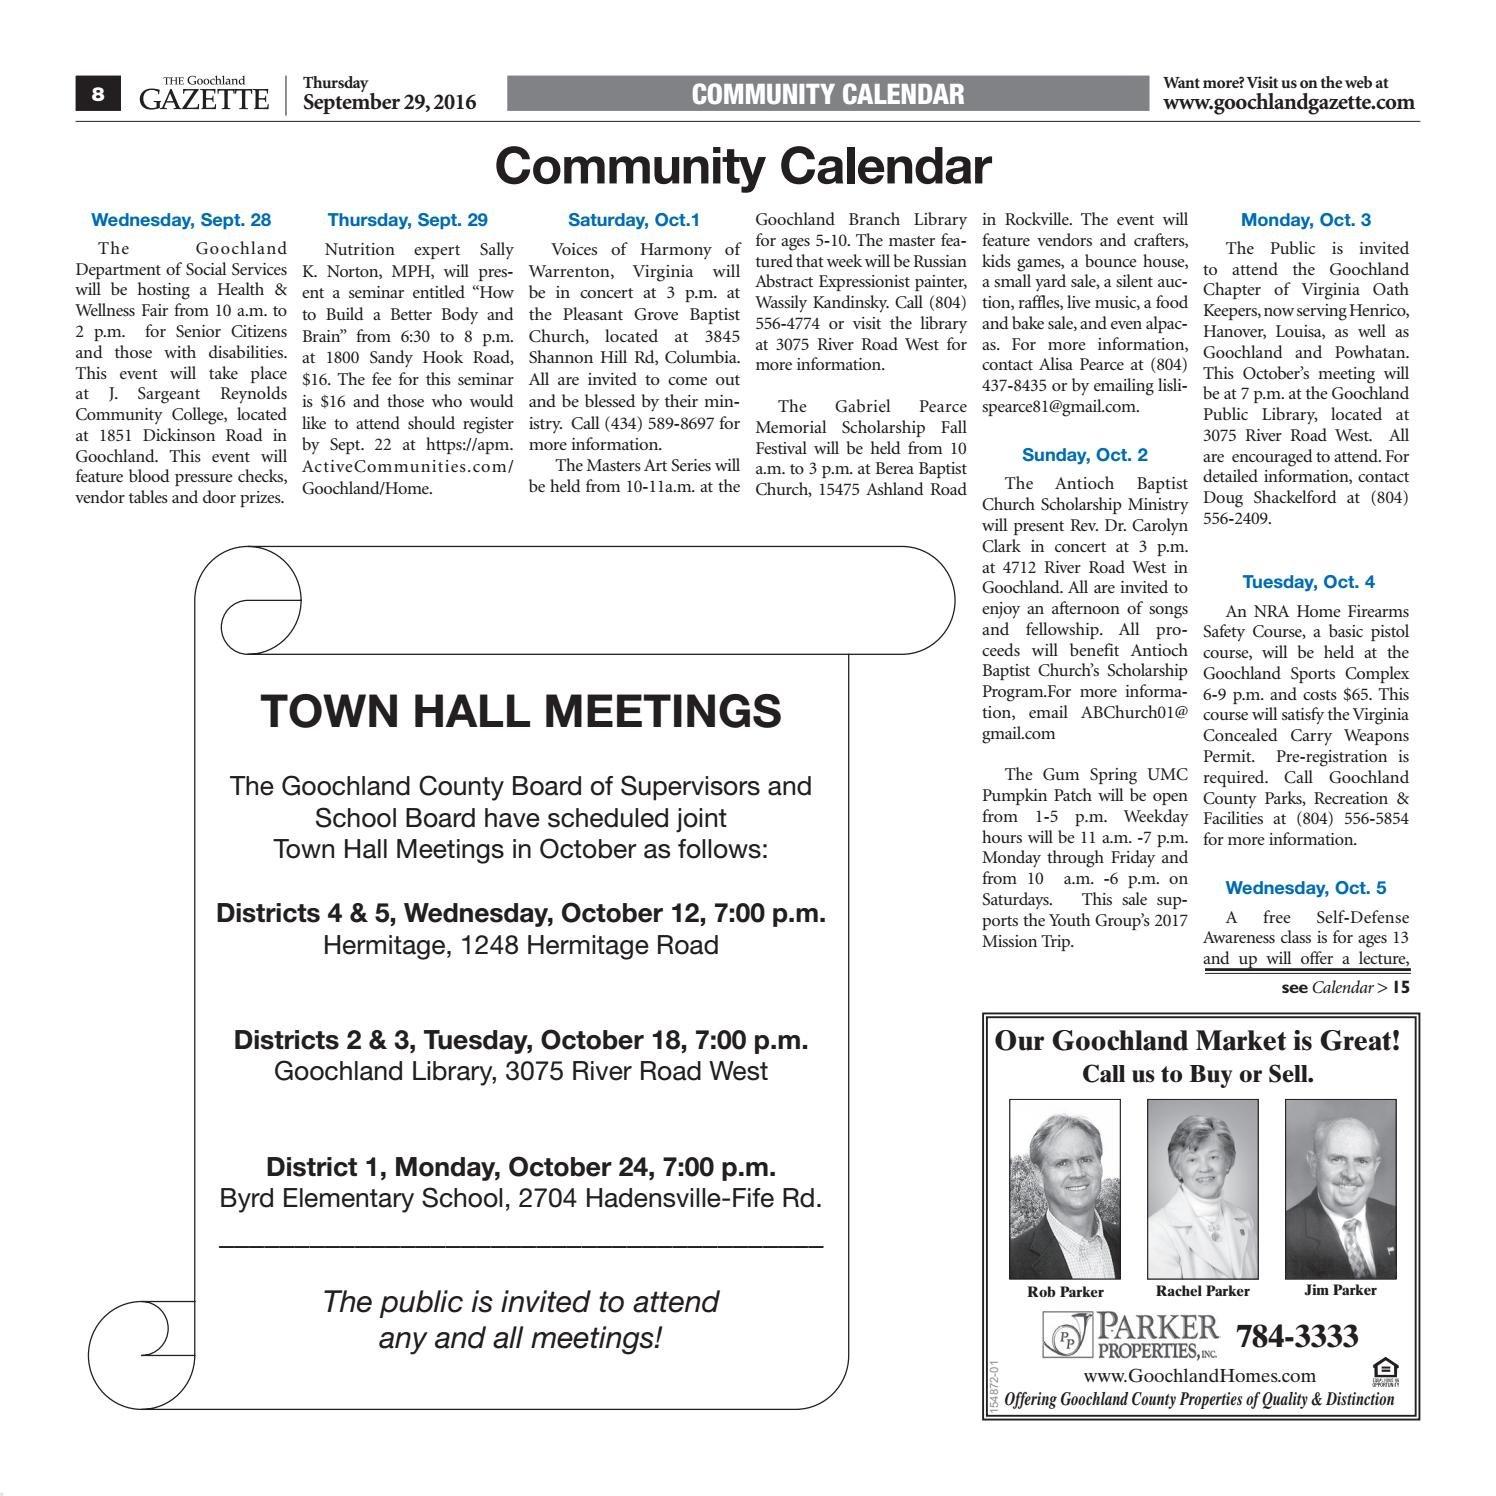 09/29/16Goochland Gazette - Issuu J Sargeant Reynolds Calendar 2019